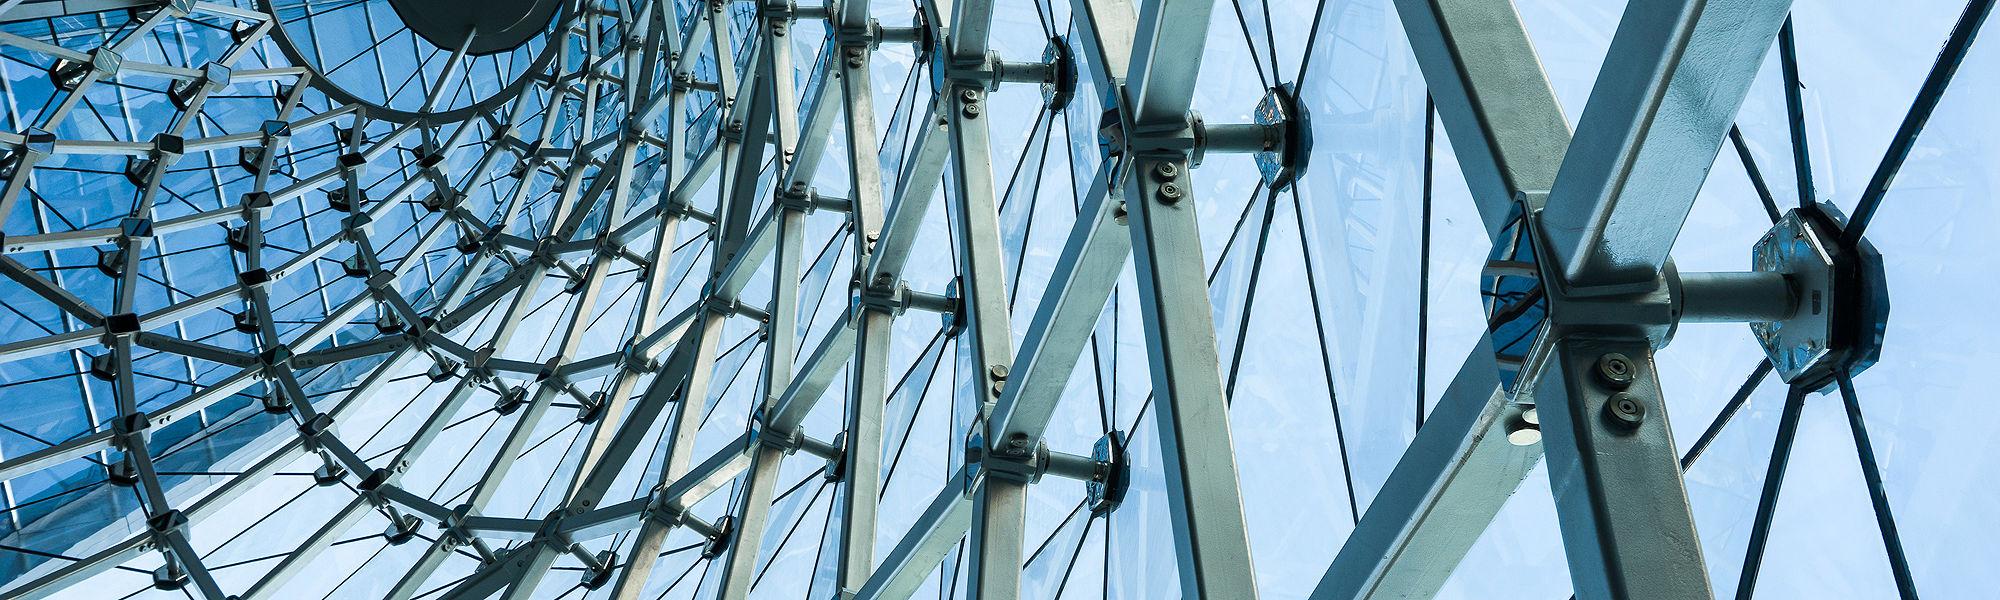 Modern building structure curve